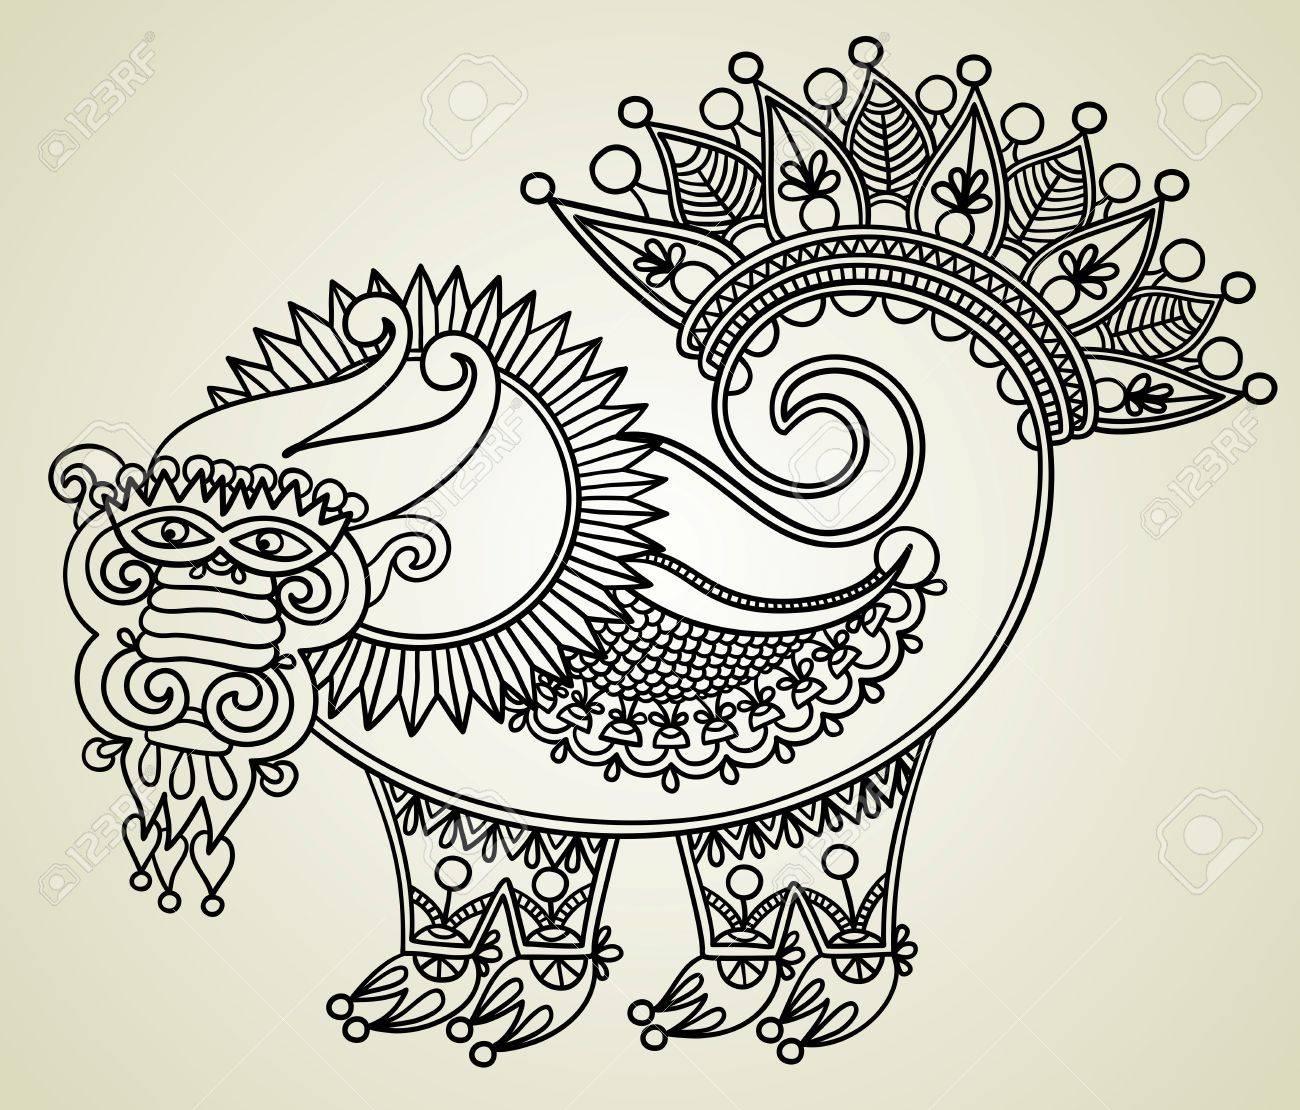 hand draw sketch unique dragon, symbol of 2012 year. Ukrainian traditional style. Stock Vector - 11638949